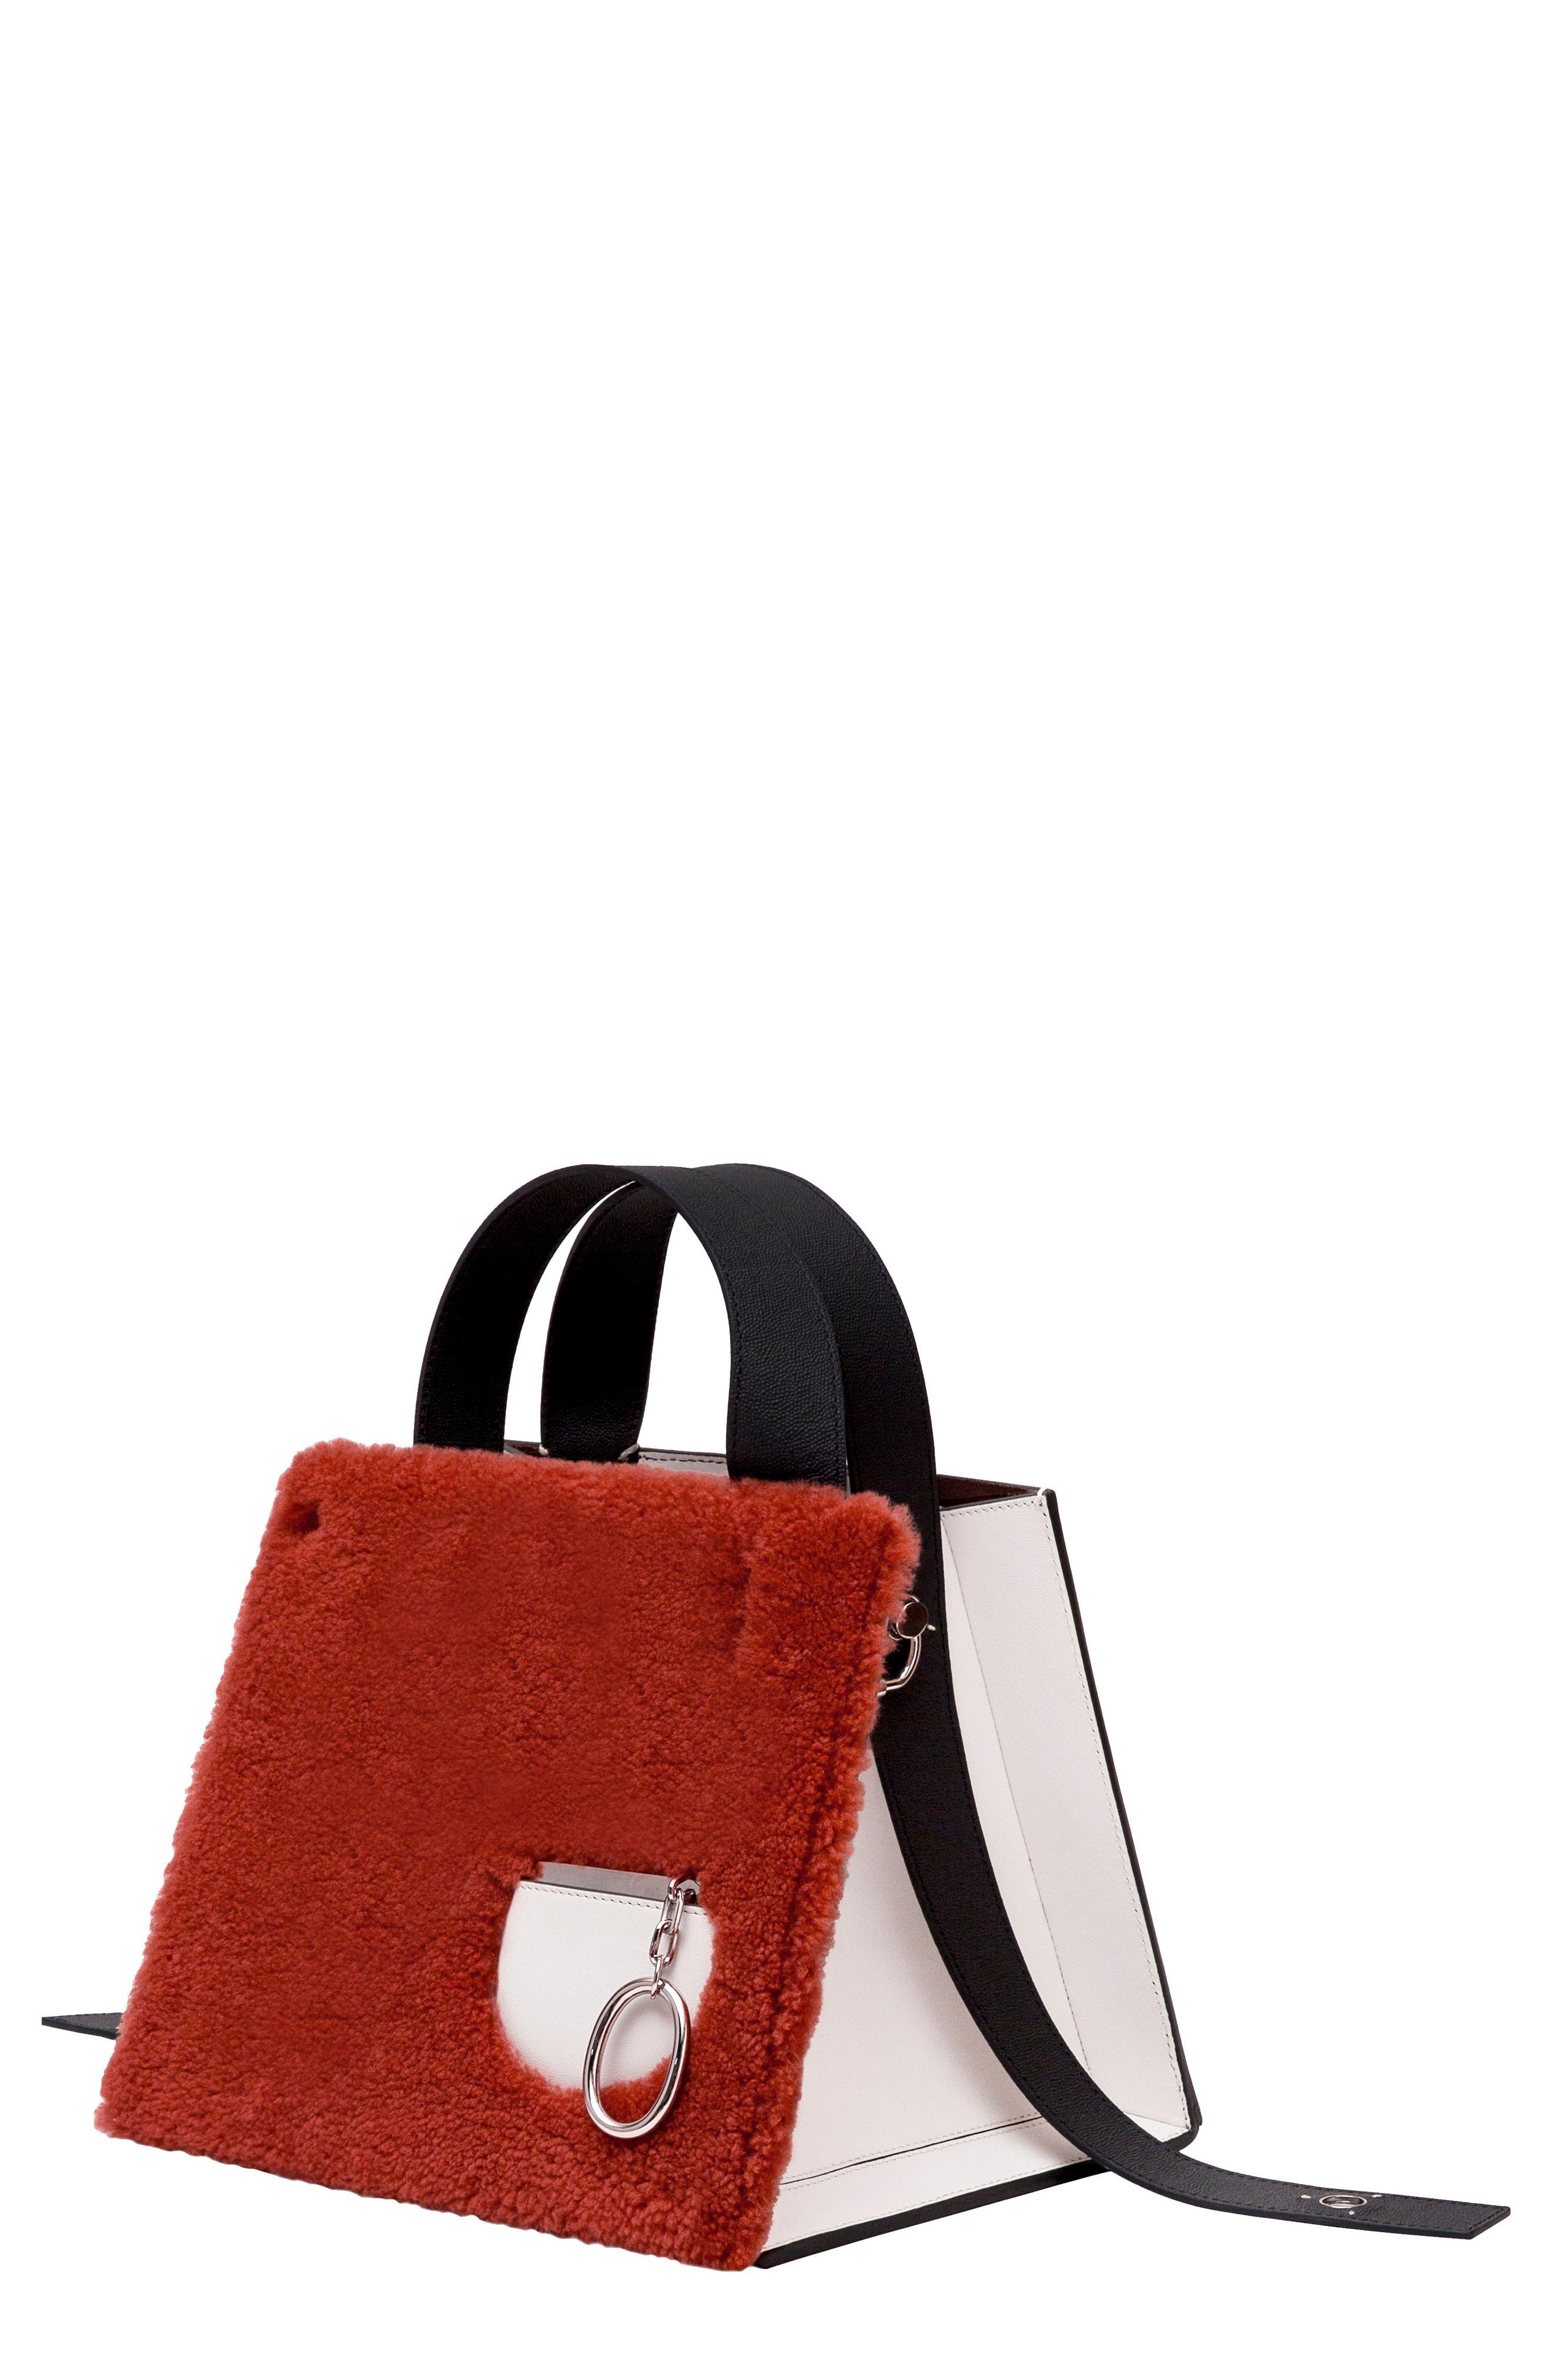 e4750da2e Danse Lente Margot Leather & Genuine Shearling Tote Bag - Brown In  Shearling Brick